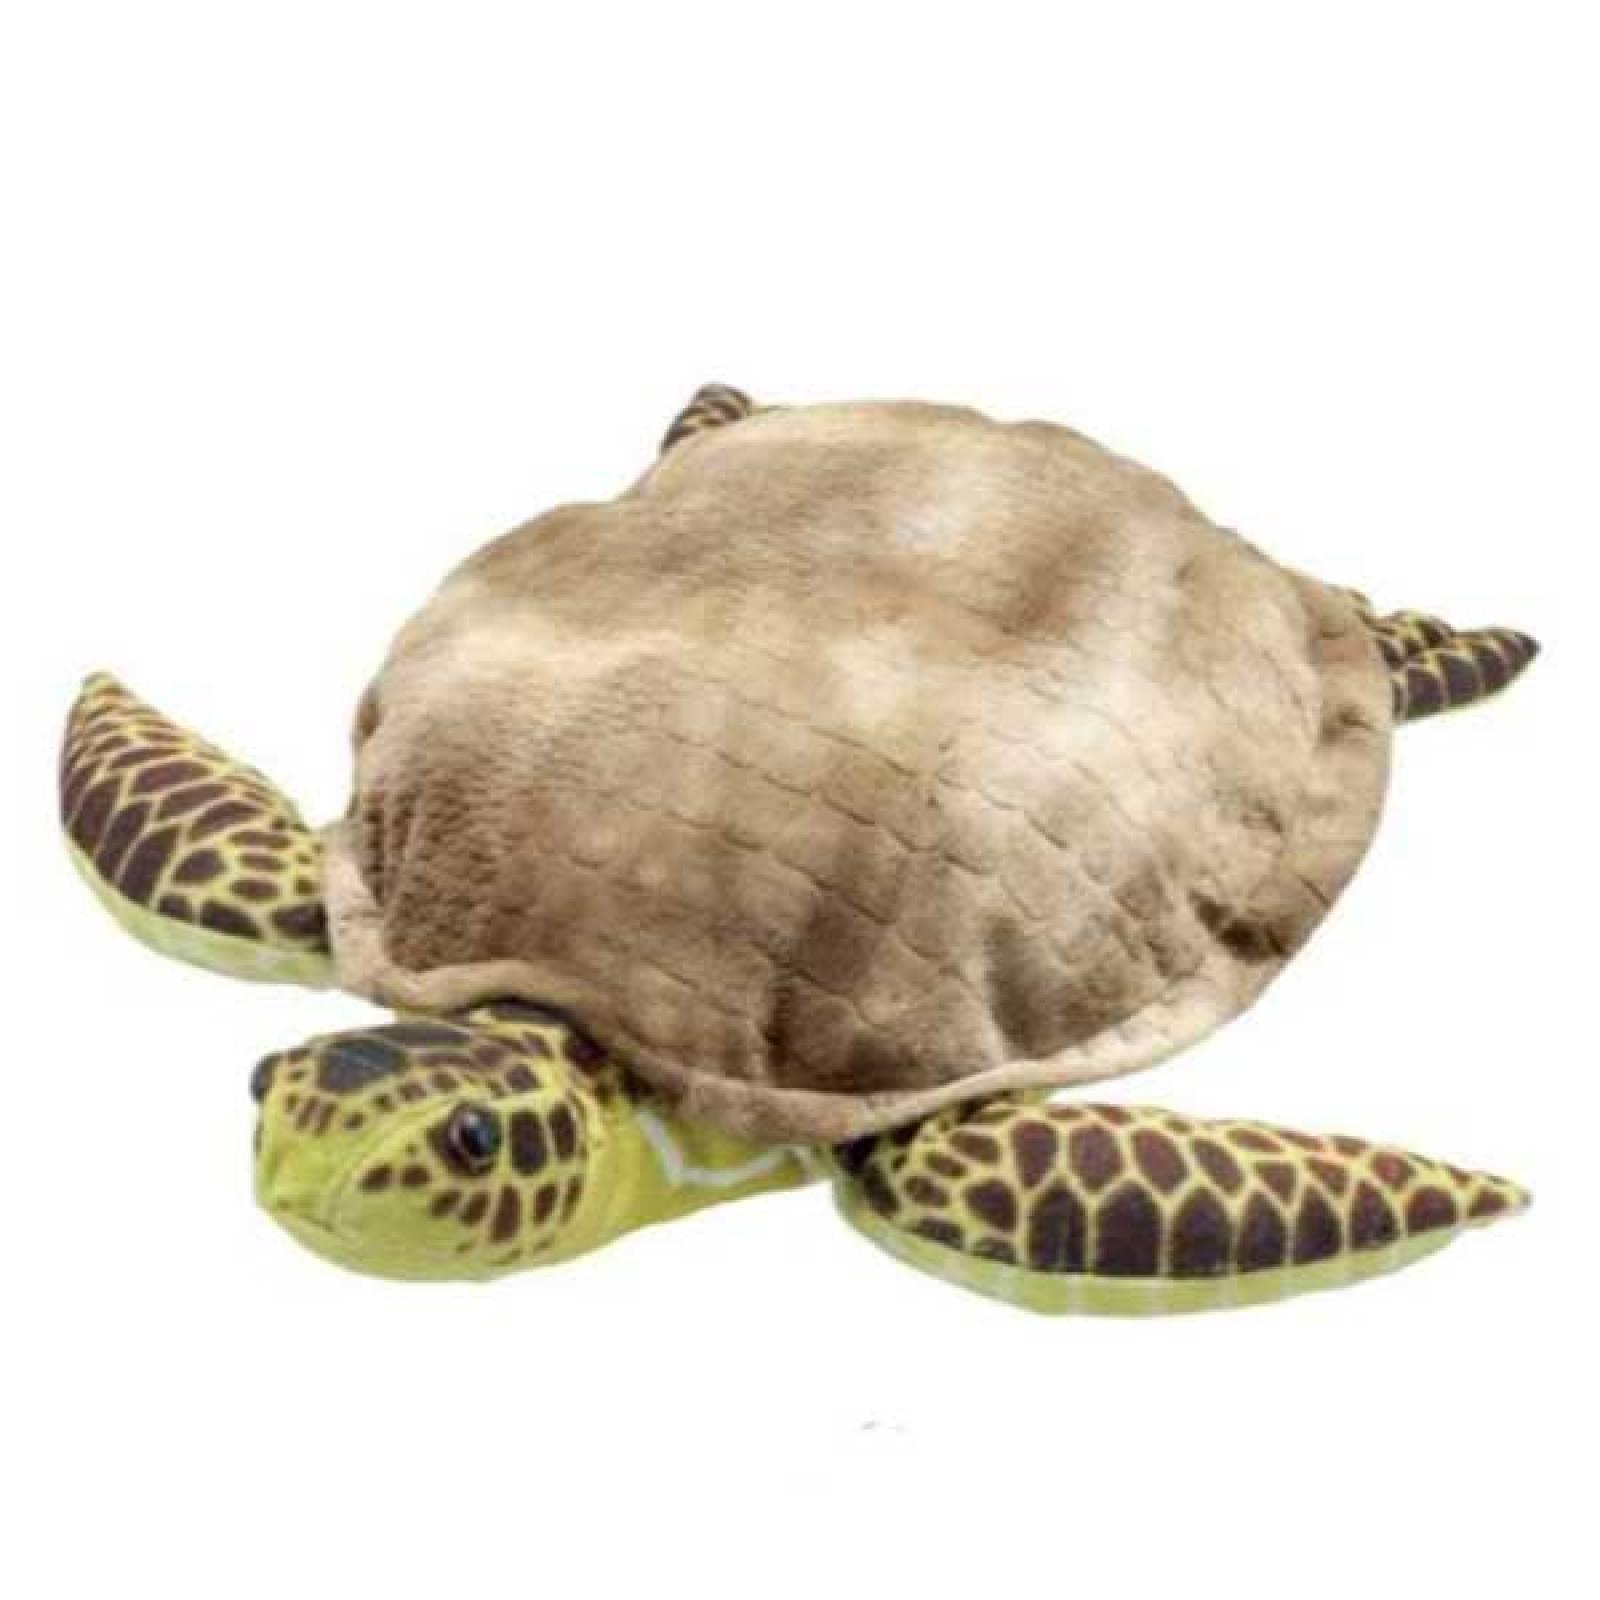 Turtle - Large Creature Puppet